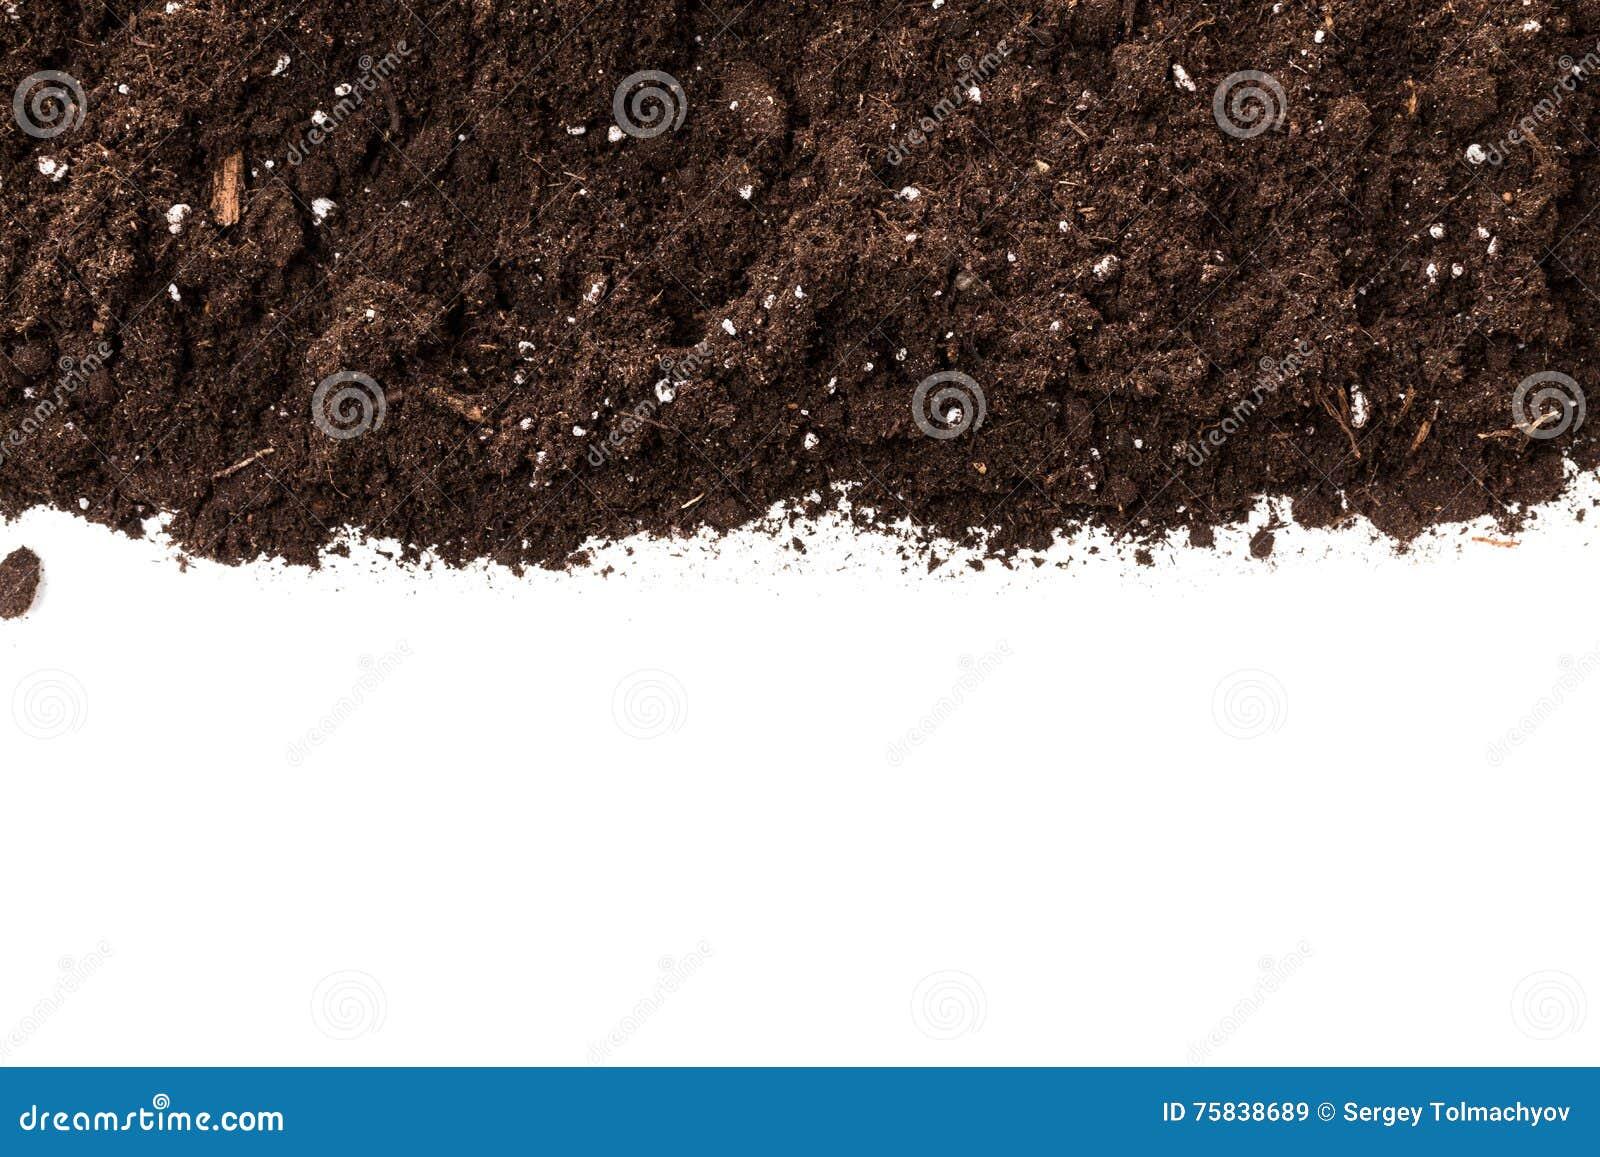 Soil or dirt section